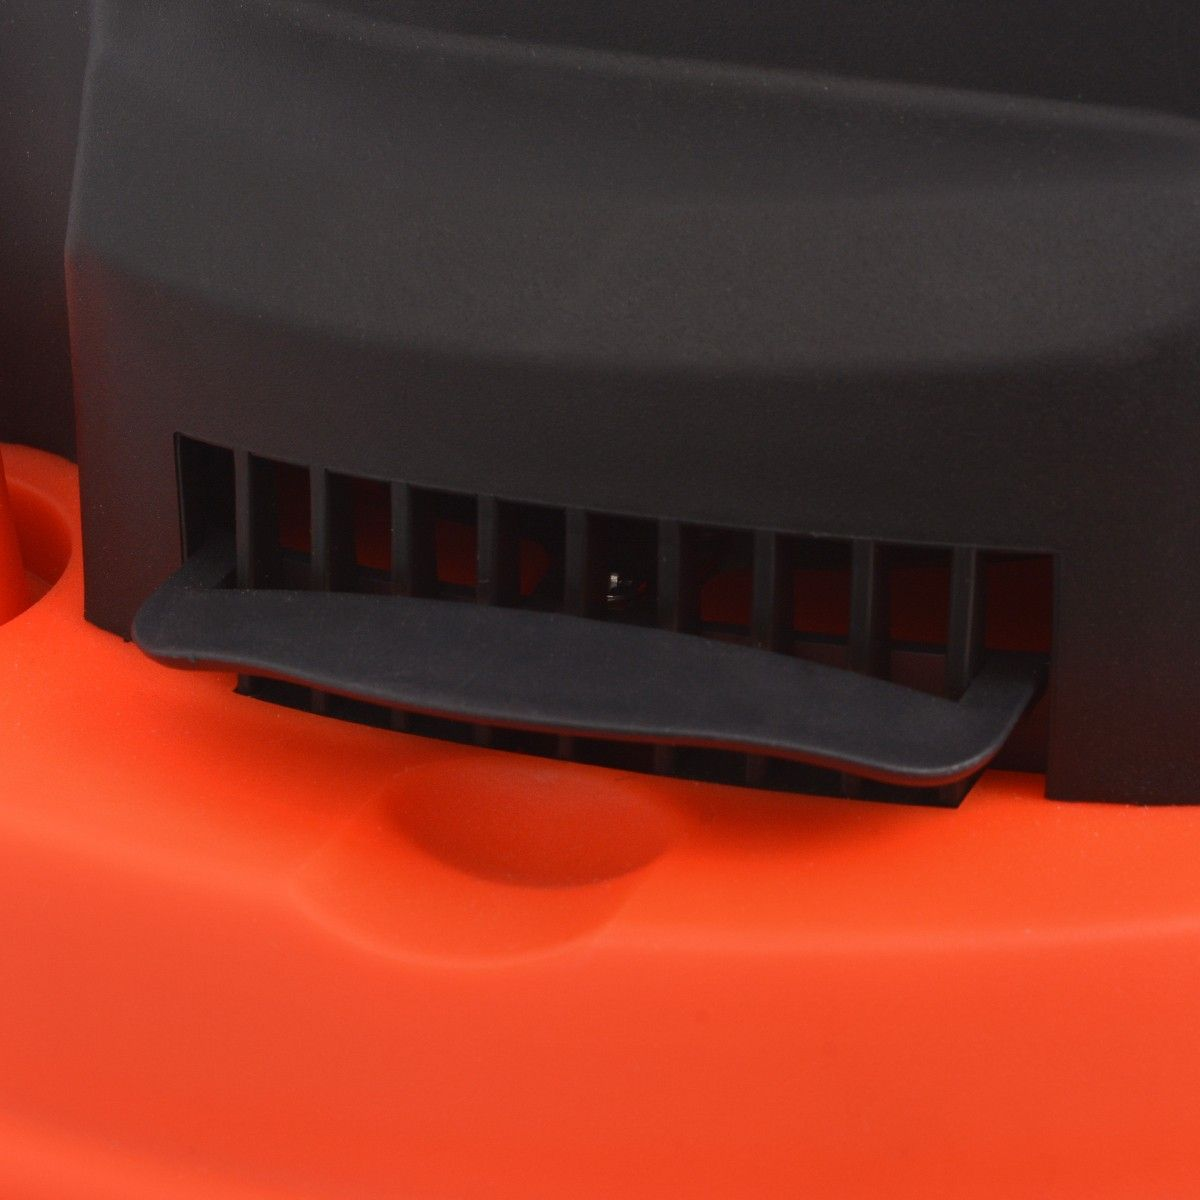 vidaXL Askestøvsuger 1200 W 20 L svart og oransje (142356